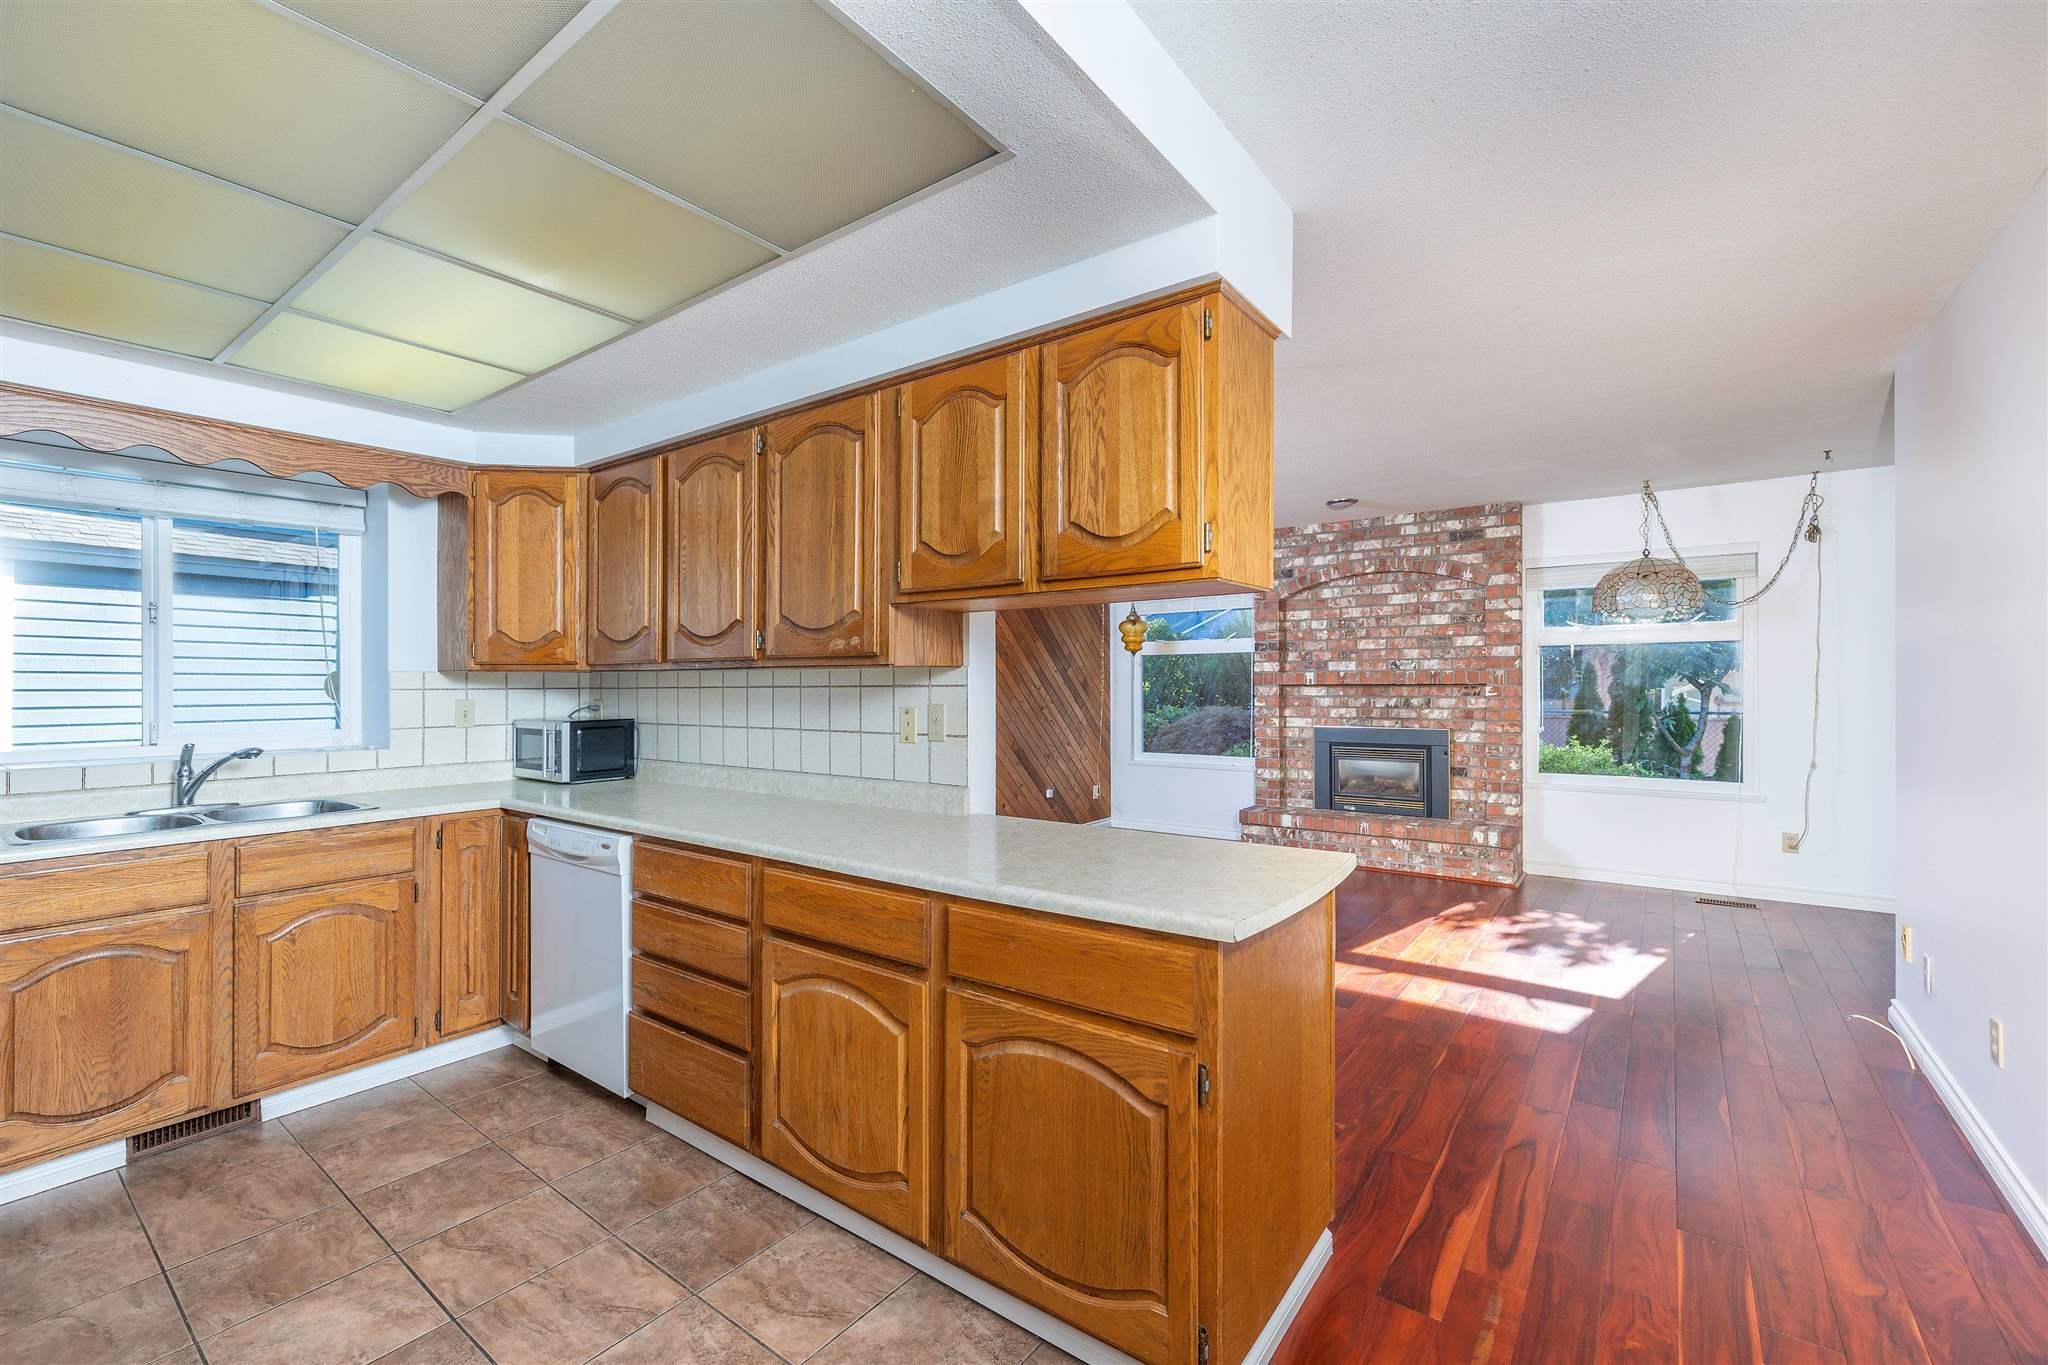 1743 148A STREET - Sunnyside Park Surrey House/Single Family for sale, 3 Bedrooms (R2604804) - #10